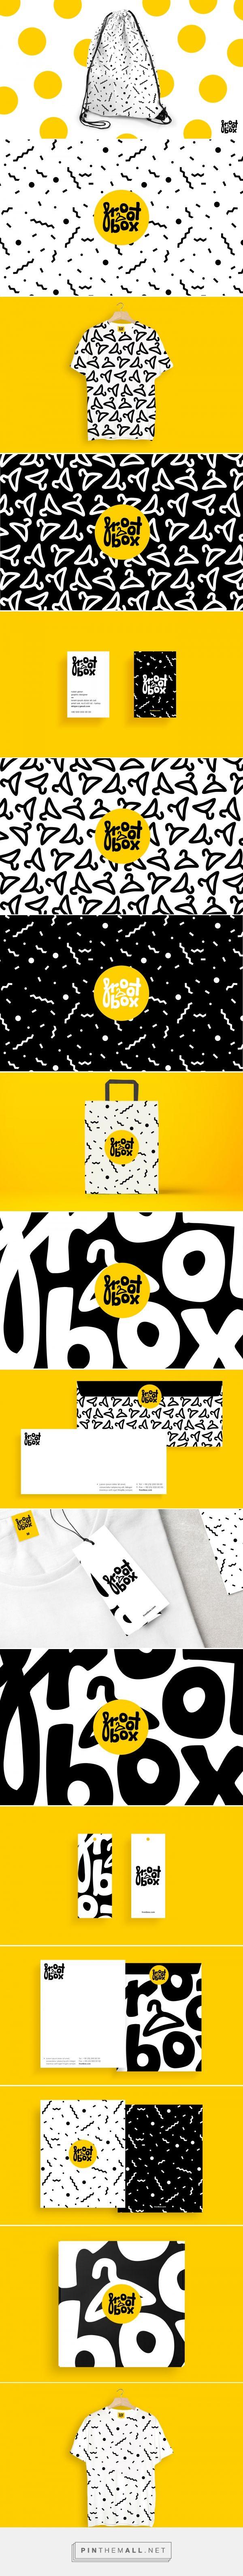 Frootbox Branding By Nuket Guner Corlan Branding Design Graphic